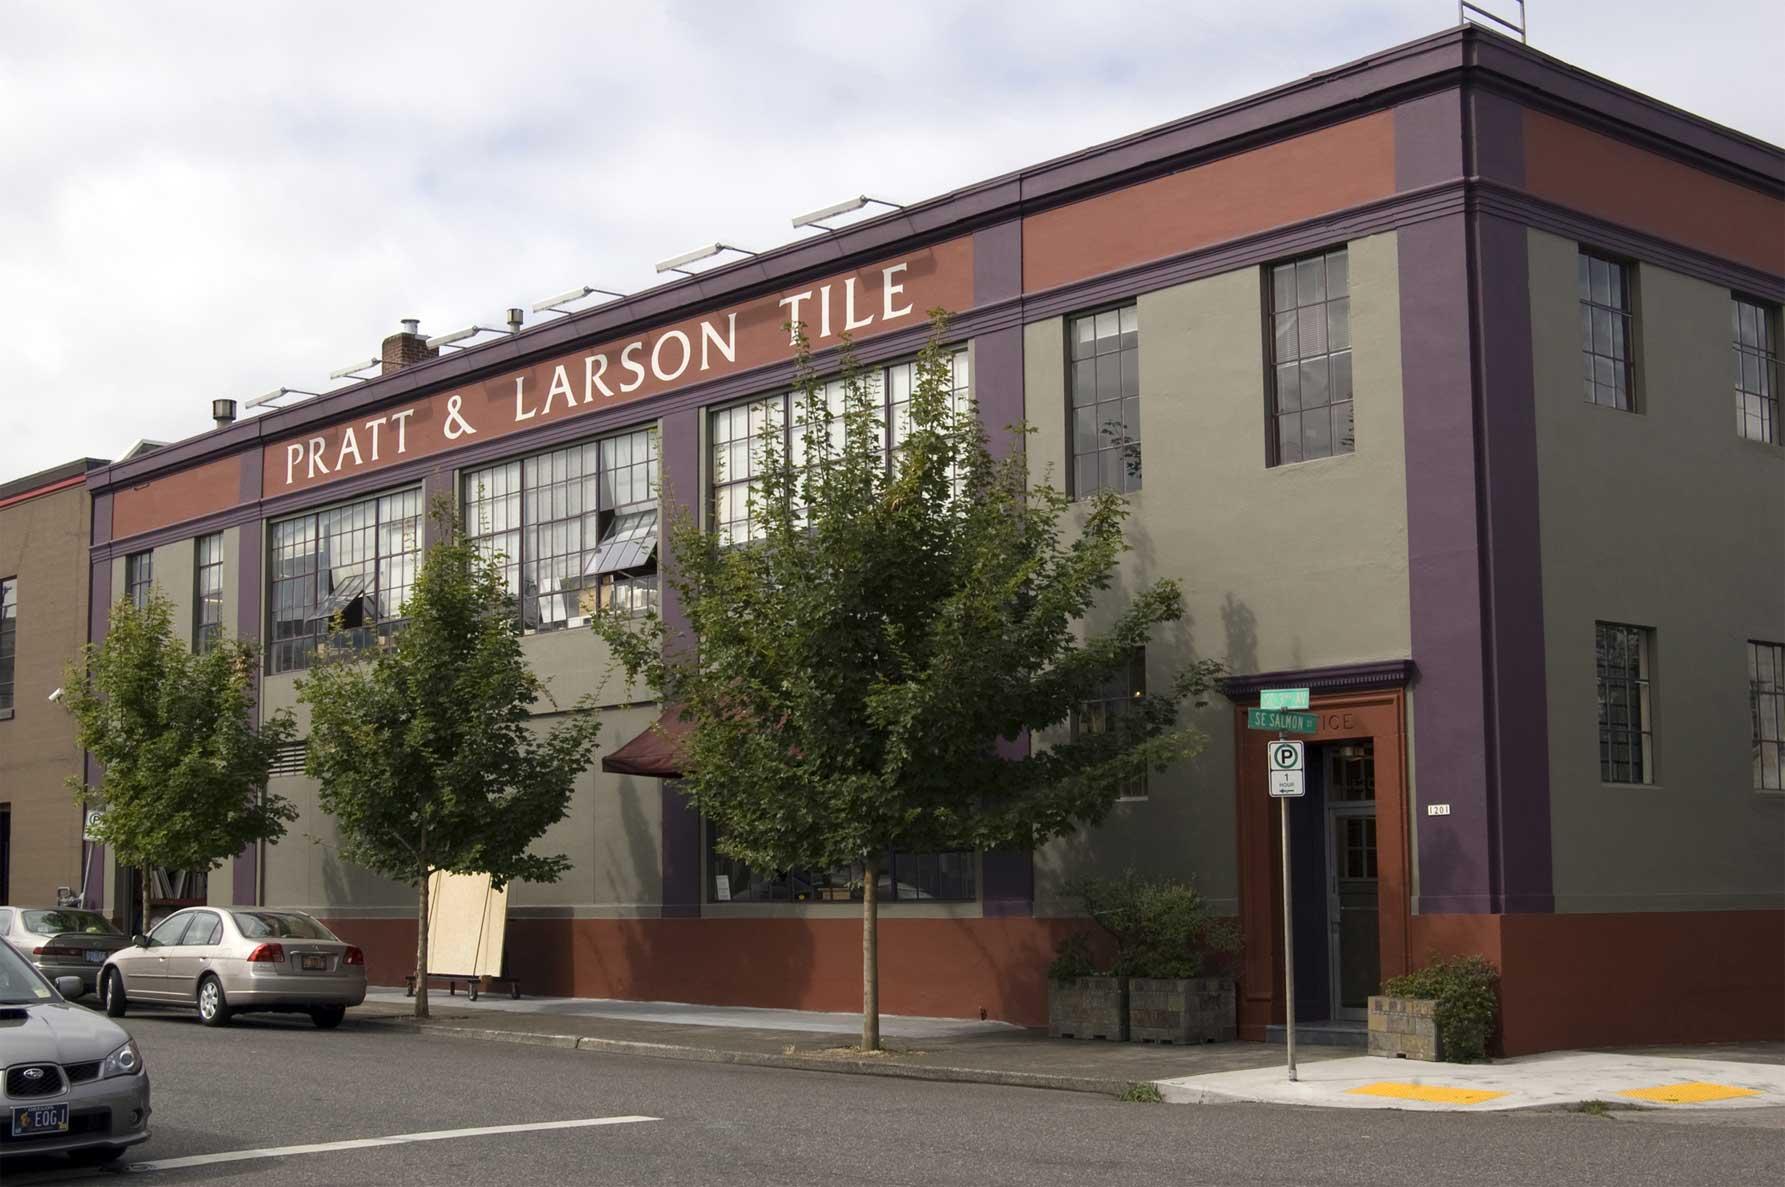 pratt larson tile and stone portland